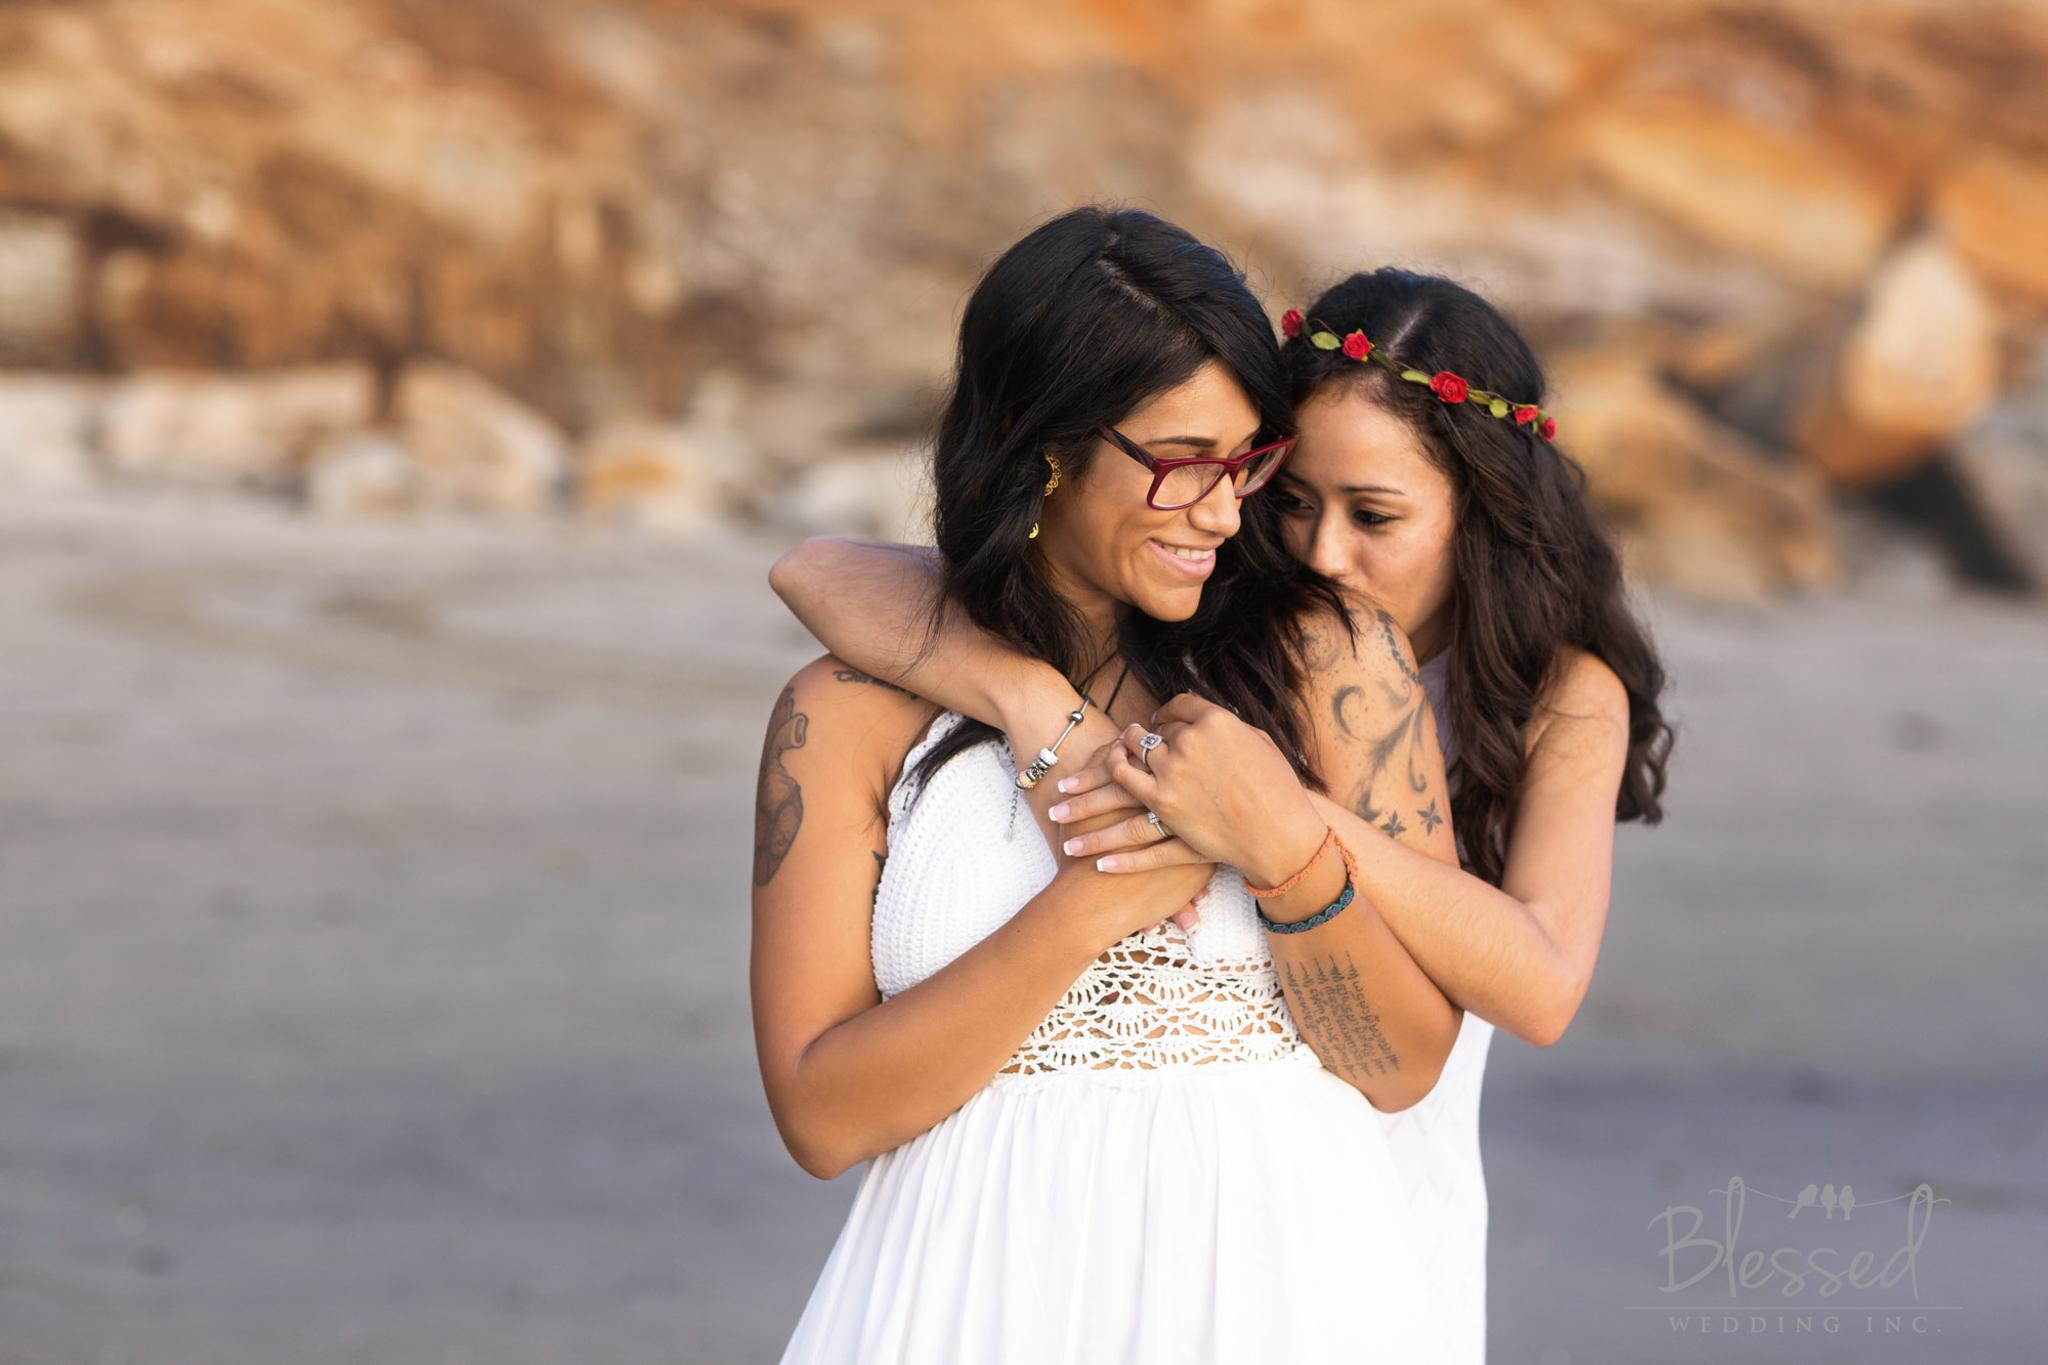 La Jolla Beach Engagement Session by San Diego Wedding Photographers Blessed Wedding-46.jpg